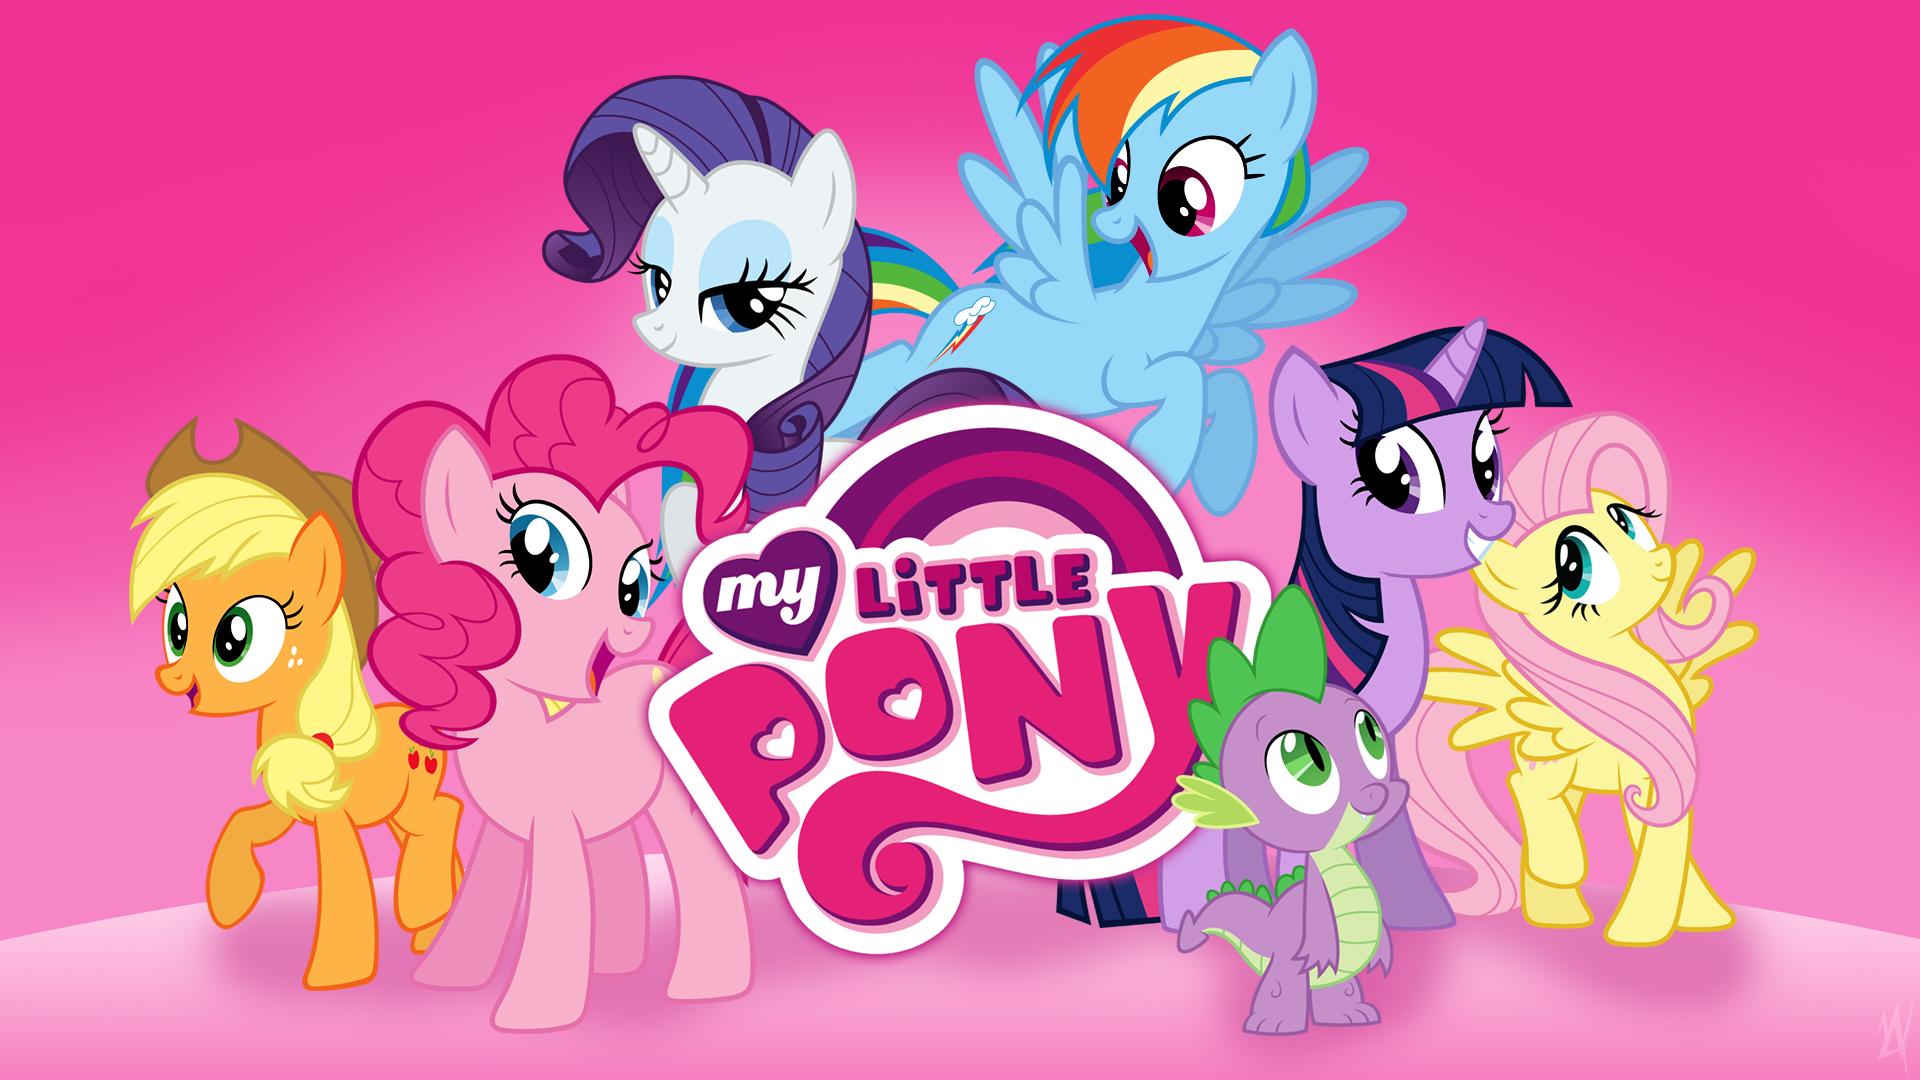 My Little Pony Wallpaper 1920x1080 61149